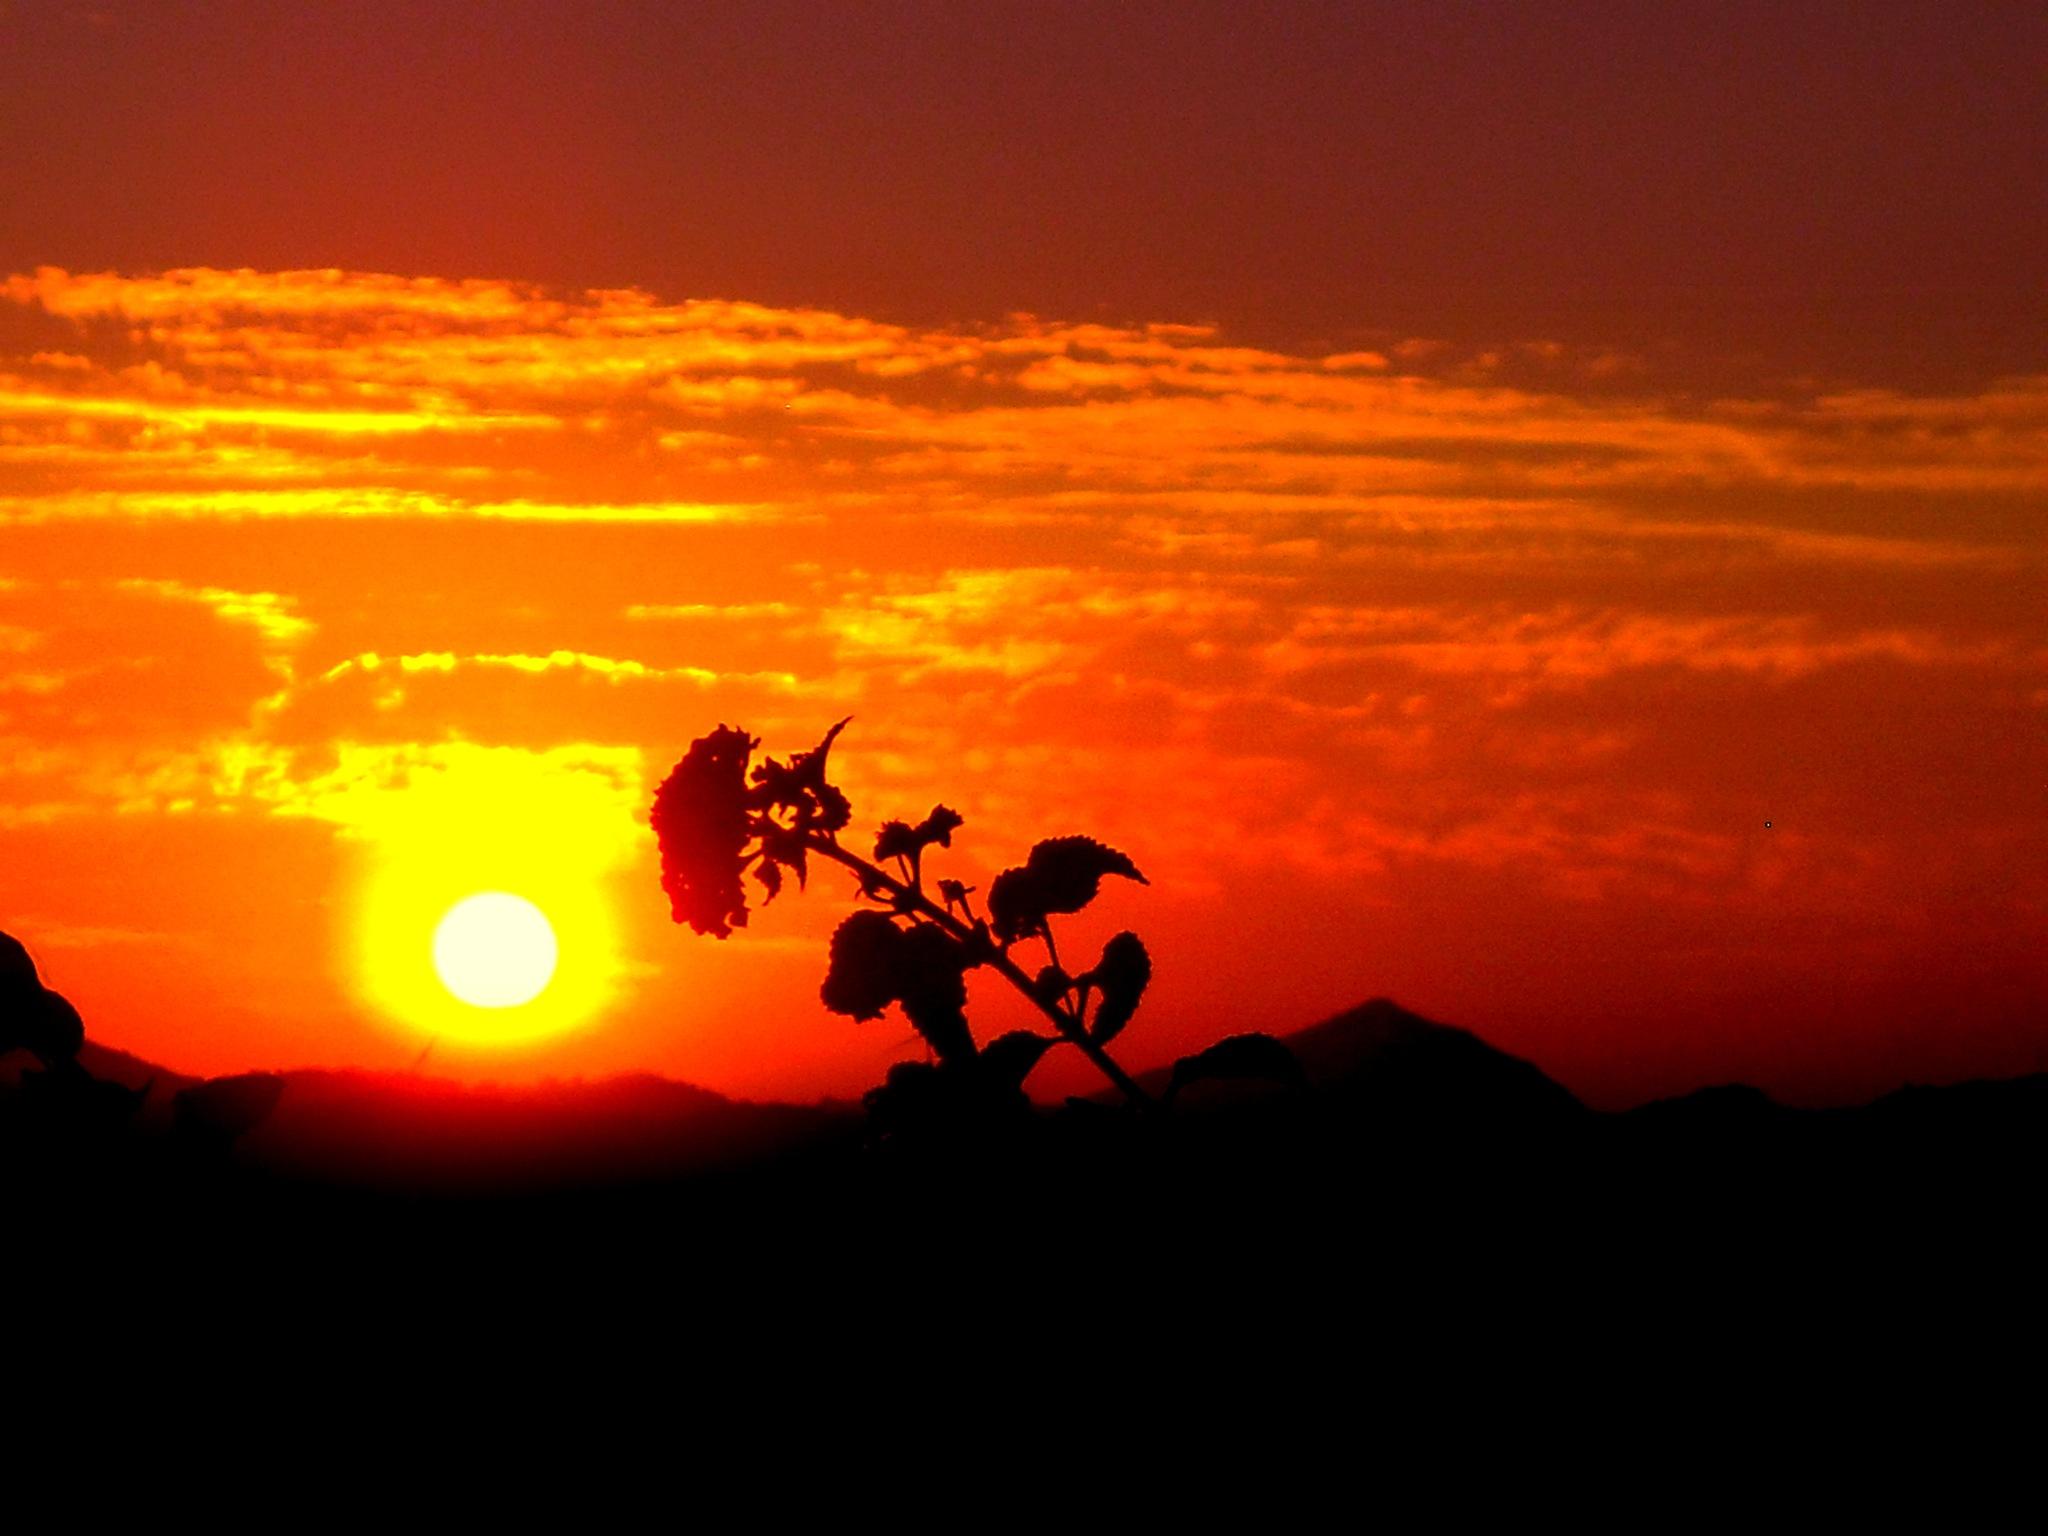 UNTITLED SUNSET by Akin Saner